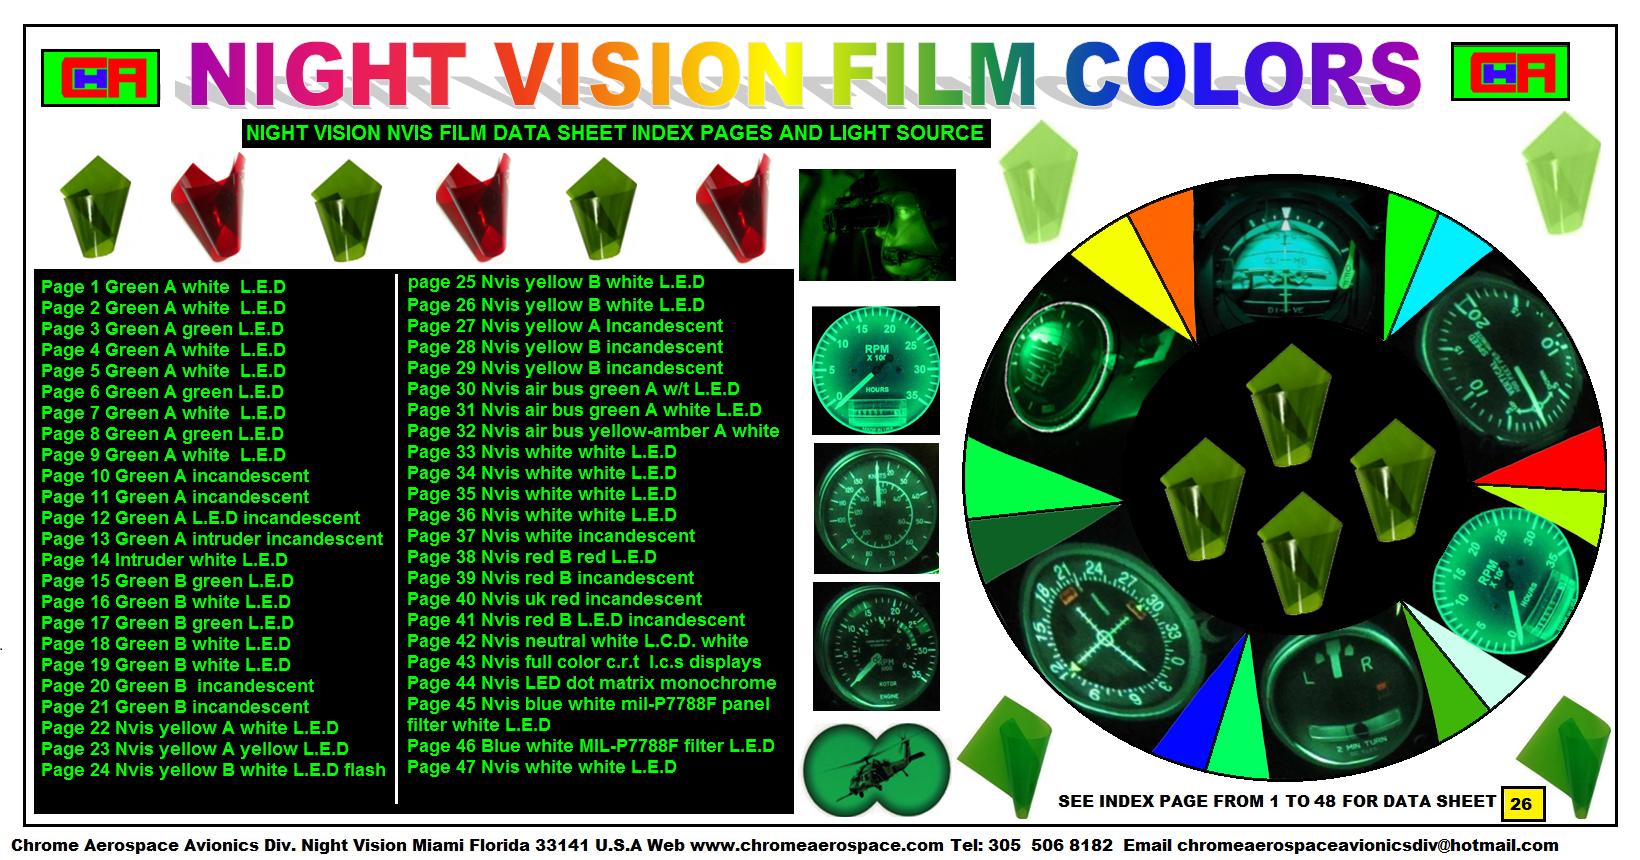 26-night-vision-film-datasheet-0.010-thick 4-3-19xx.png 955 SMD PLCC LED